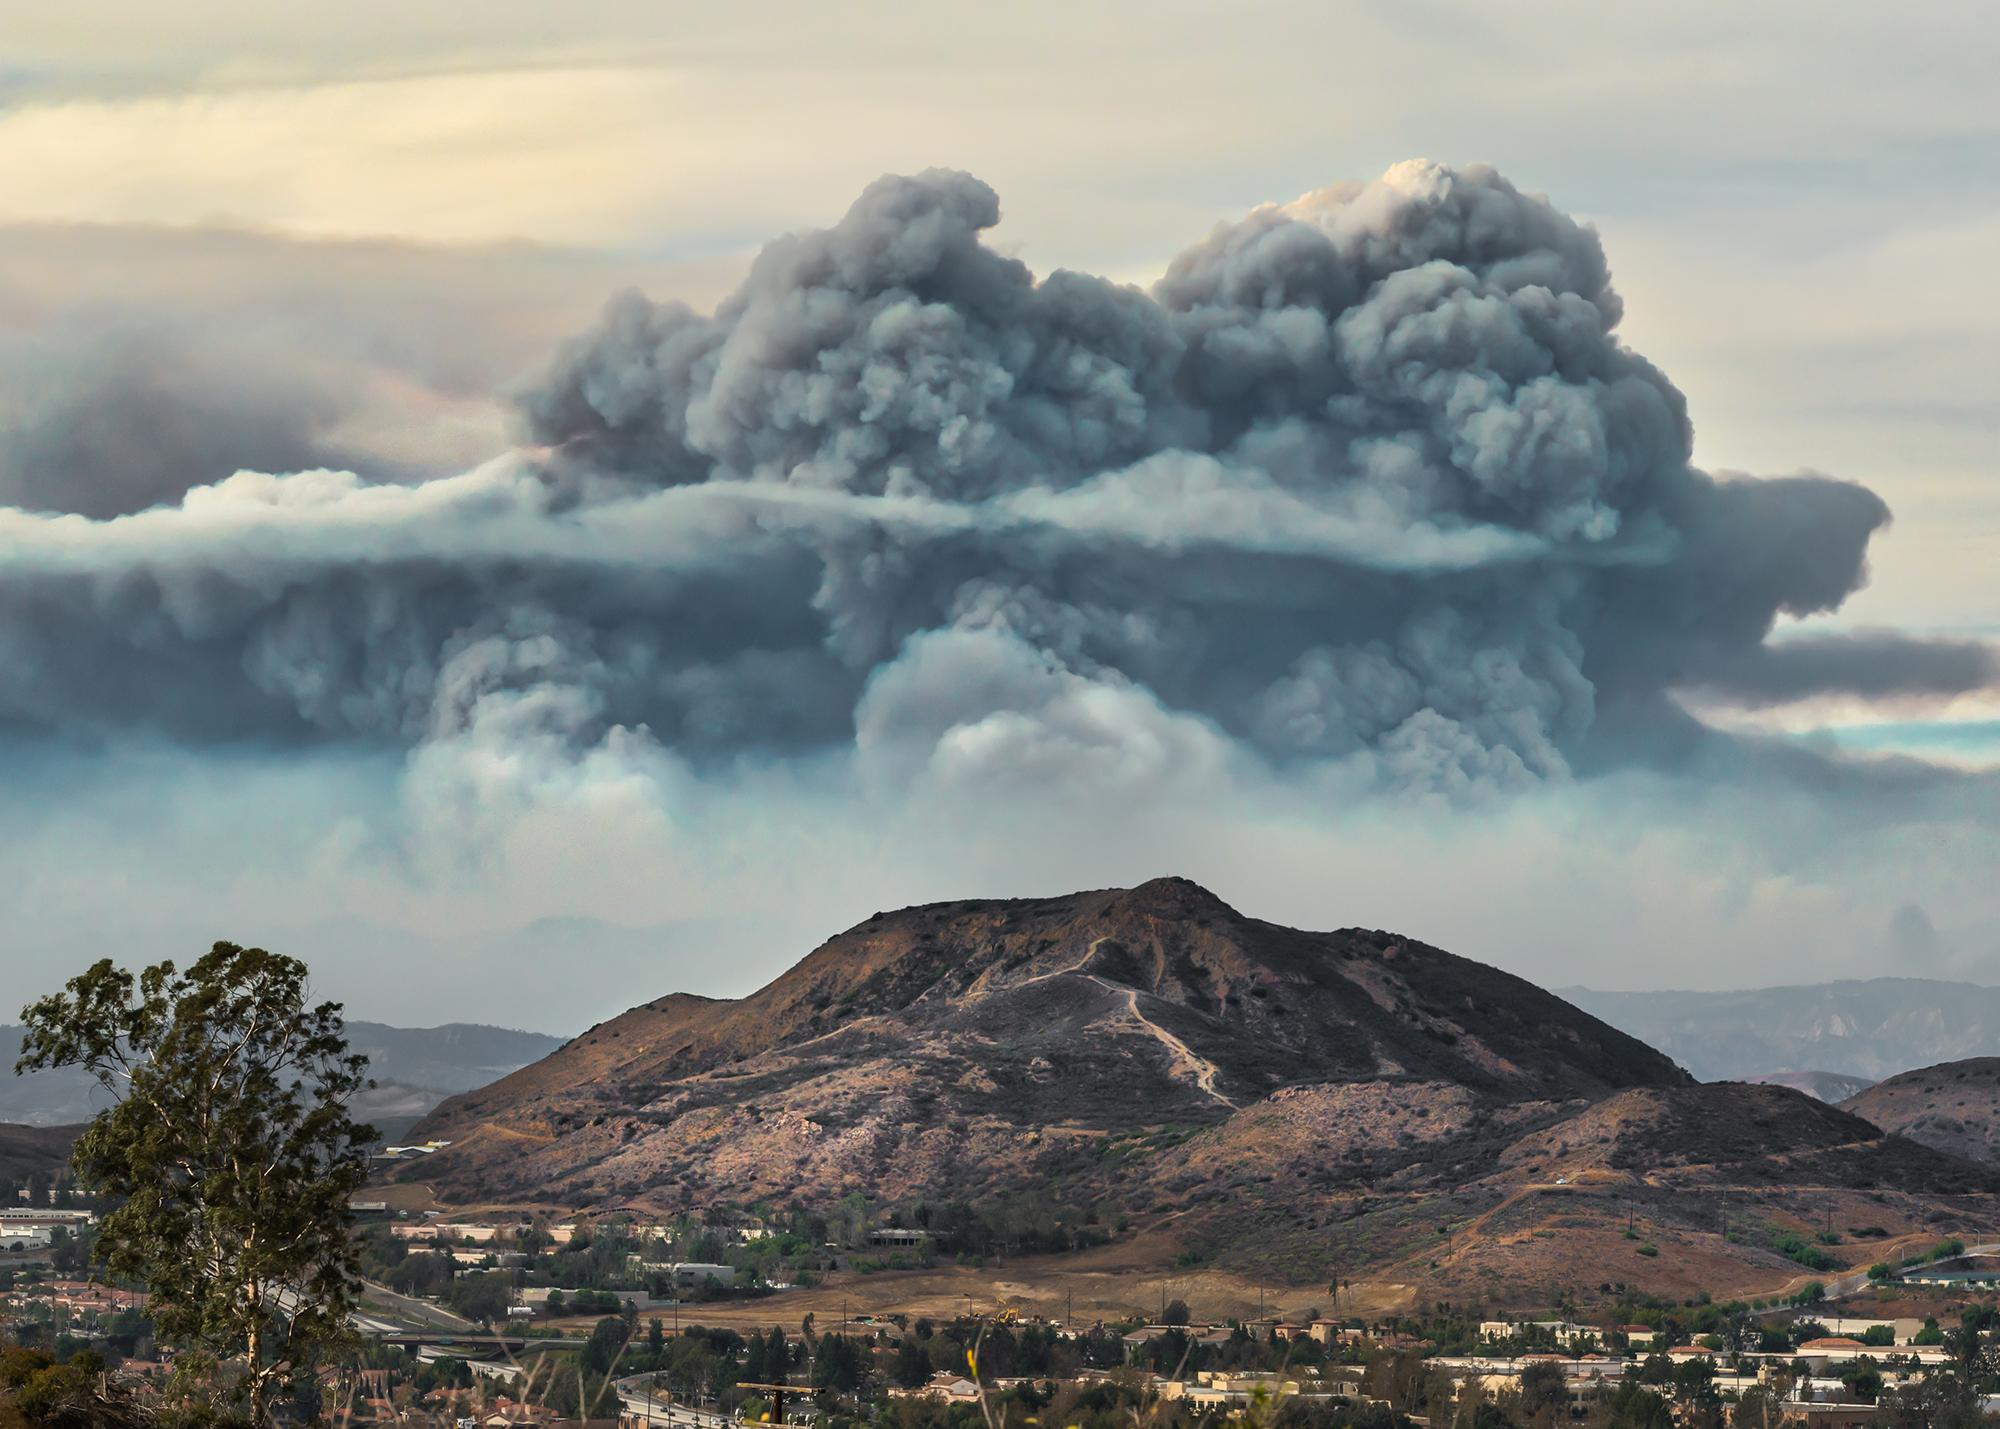 The thomas fire raises above southern california mountains.